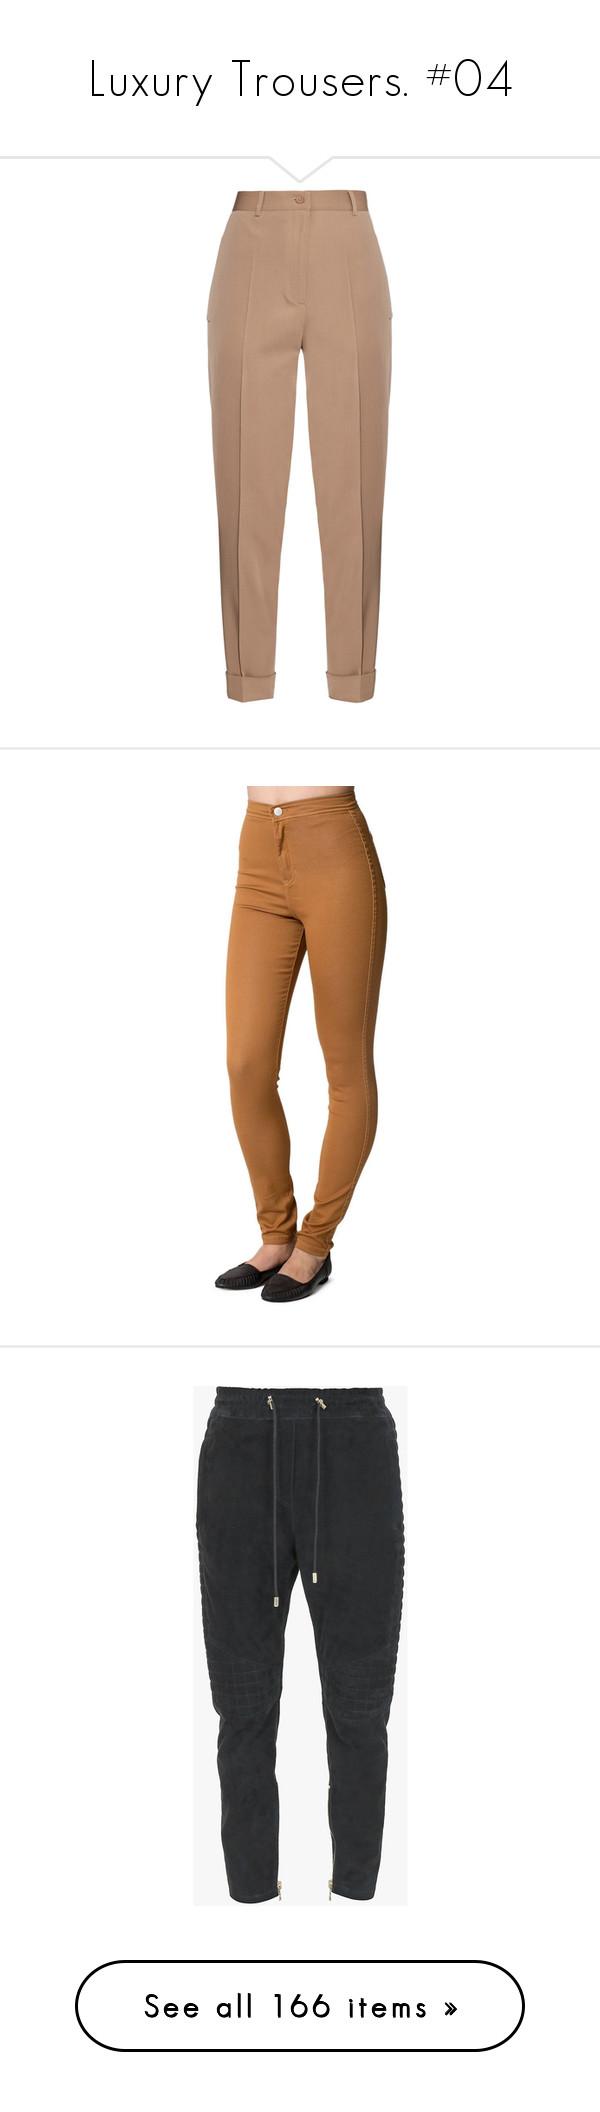 """Luxury Trousers. #04"" by alejandramalagon ❤ liked on Polyvore featuring pants, bottoms, trousers, bottega veneta, jeans, beige, tan pants, twill pants, highwaist pants and wool pants"